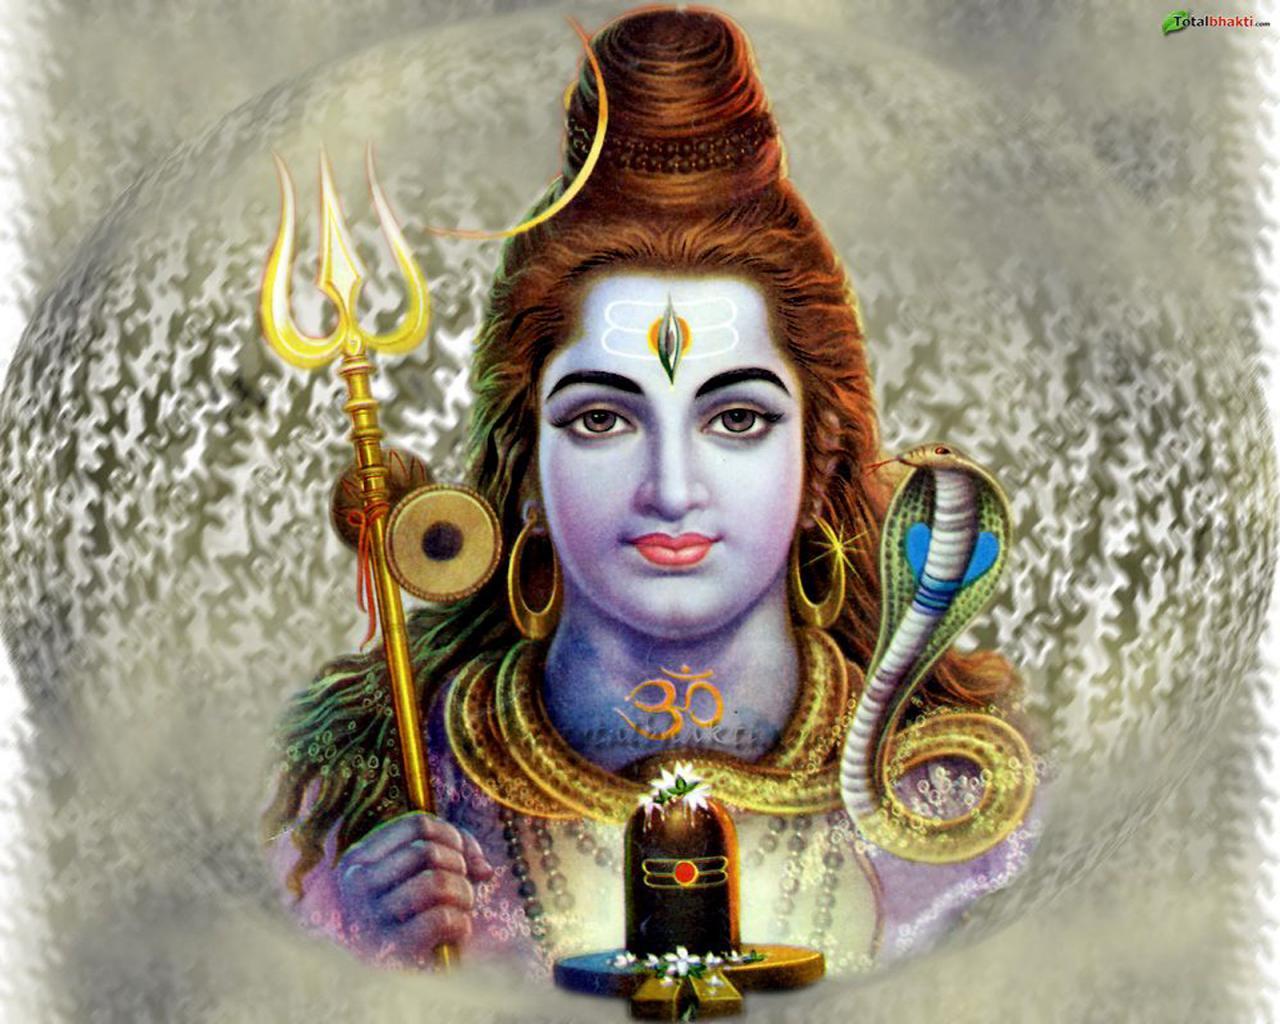 http://2.bp.blogspot.com/-eAFp8OjGutU/TzTt0XfkFcI/AAAAAAAAAas/kGLMqqRYEgw/s1600/Lord-Shiva-Art-Pictures-HD-6.jpg